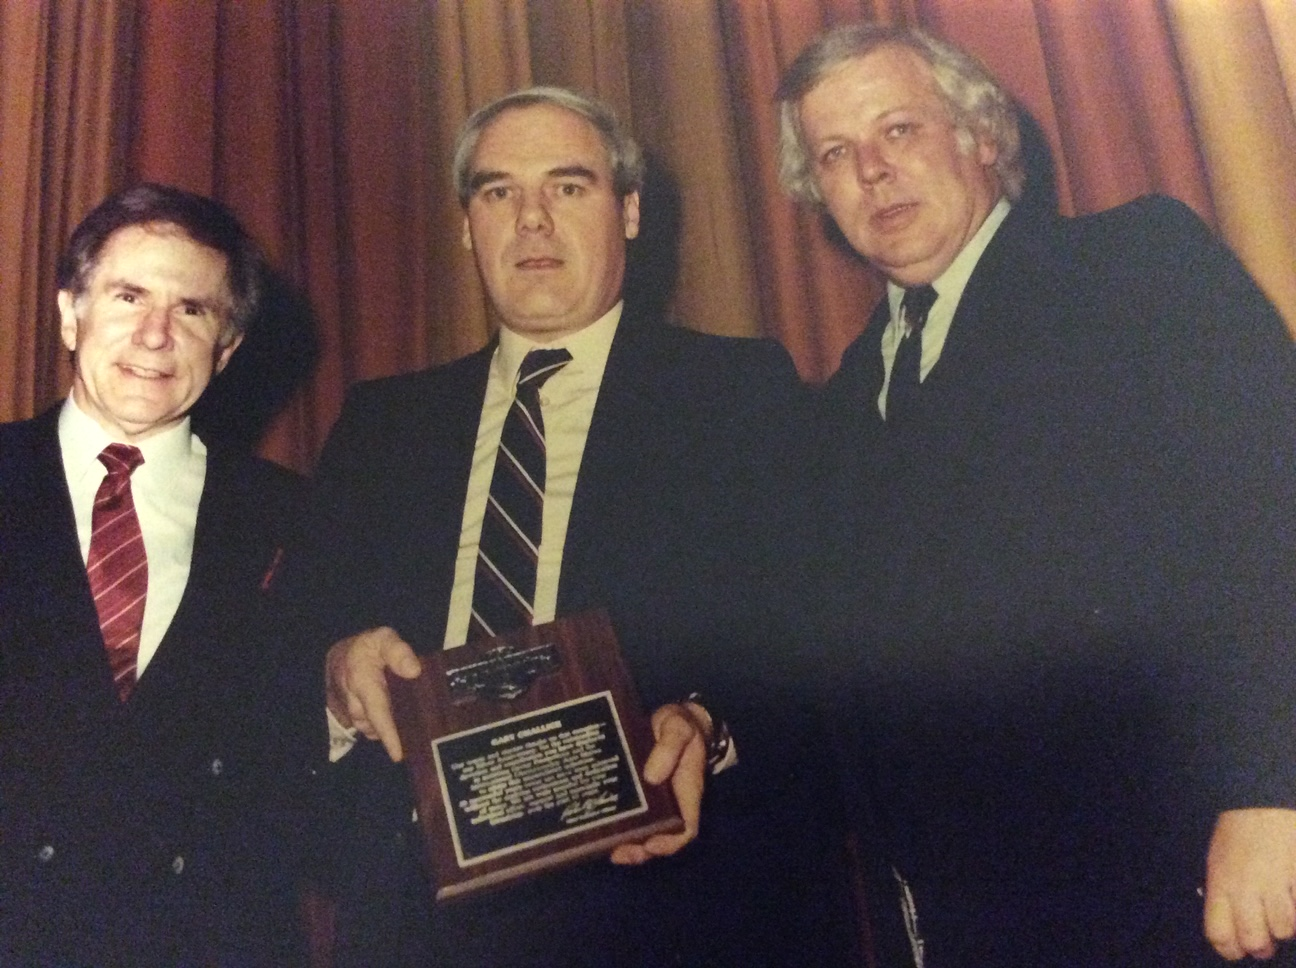 Bob, Gary & Bruce Robertson - SpeedSport Toronto 1986